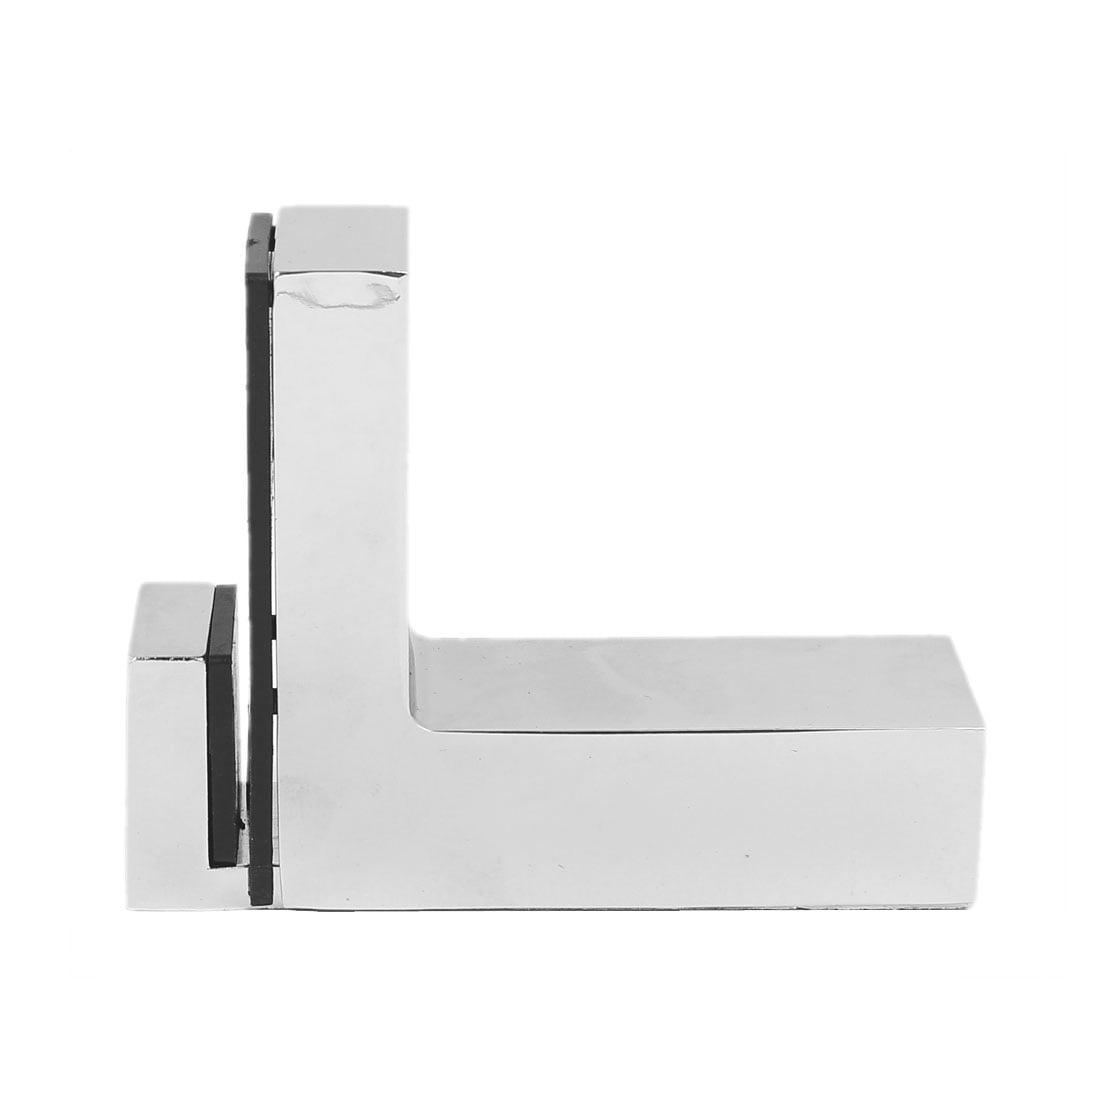 Wall Cabinet Metal Adjustable Glass Clip Shelf Clamp Support Bracket Holder - image 4 of 6